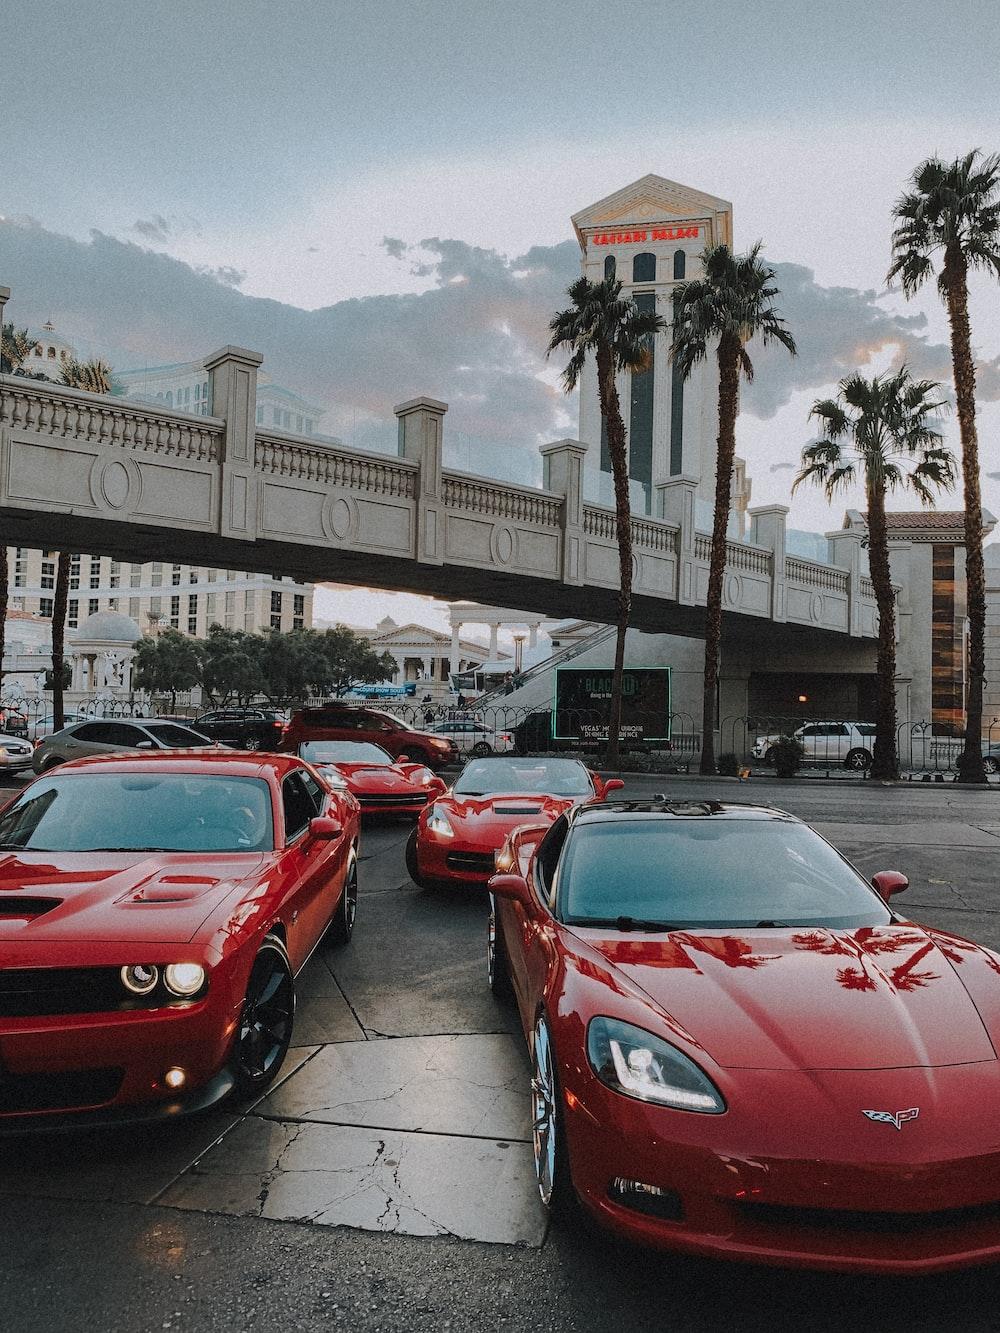 red ferrari 458 italia parked on sidewalk during daytime